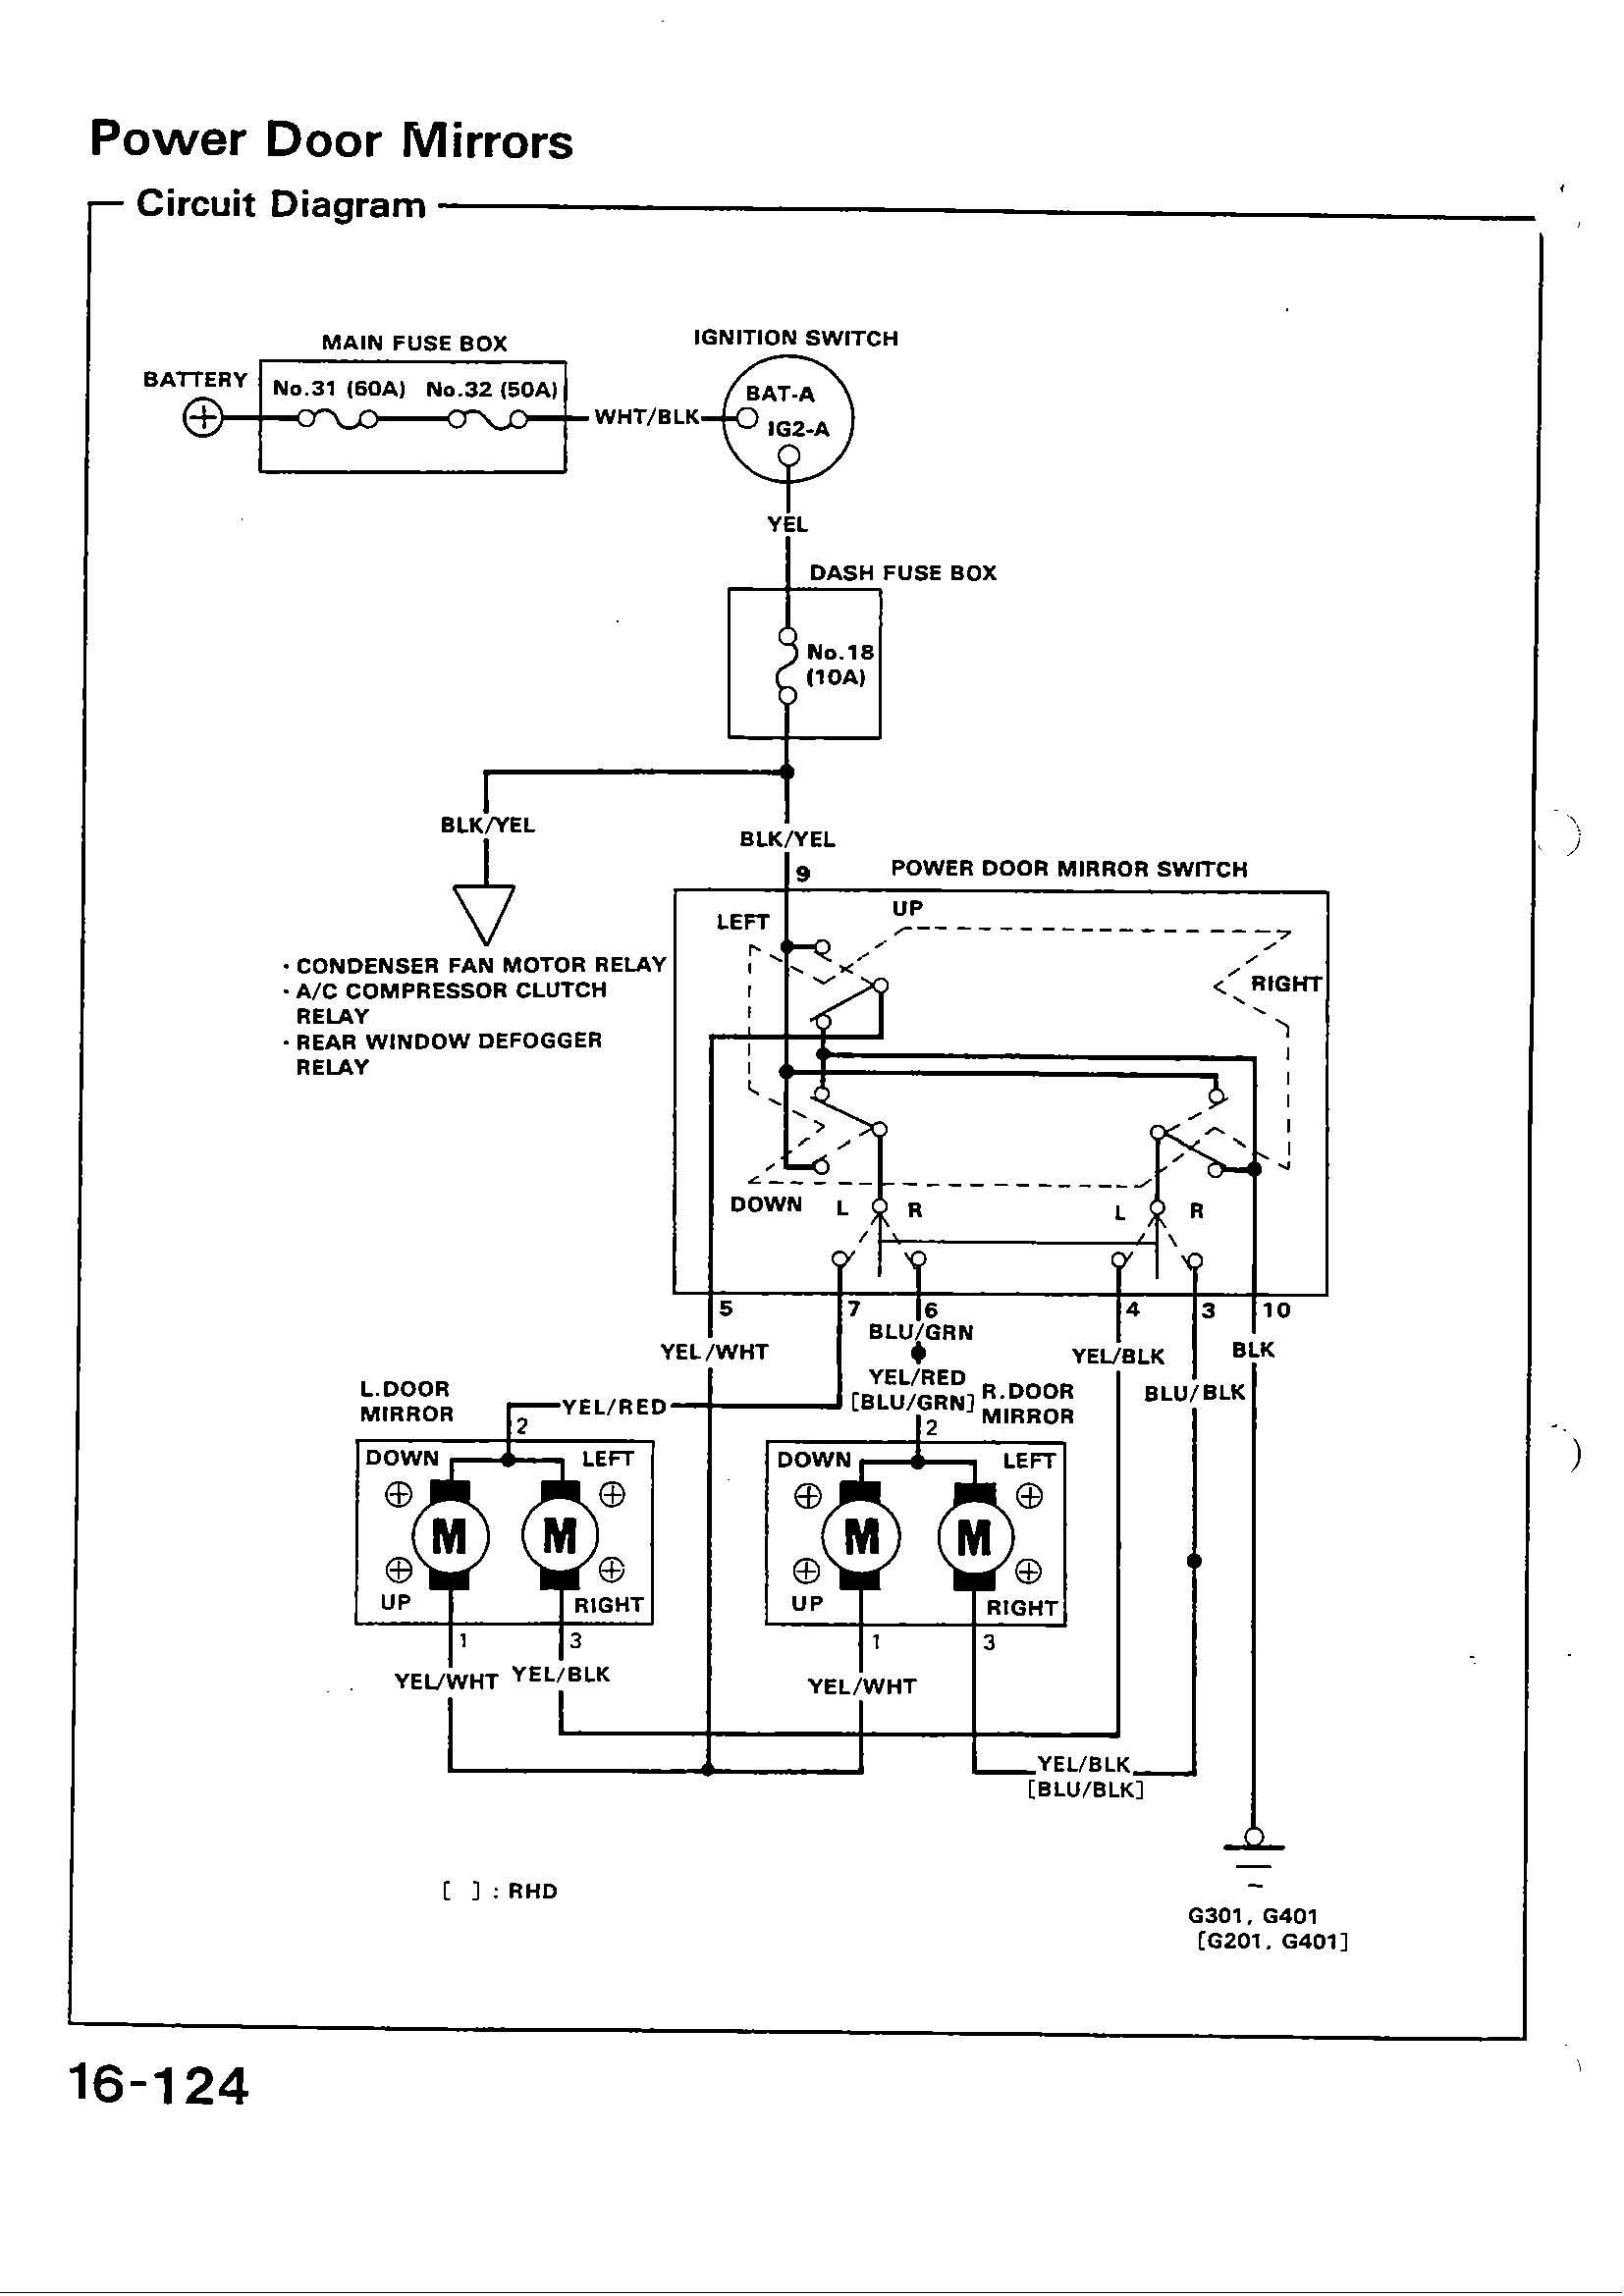 Civic Main Relay Wiring Diagram Schematics Diagrams 94 Honda Lx Crx 29 Images 2000 96